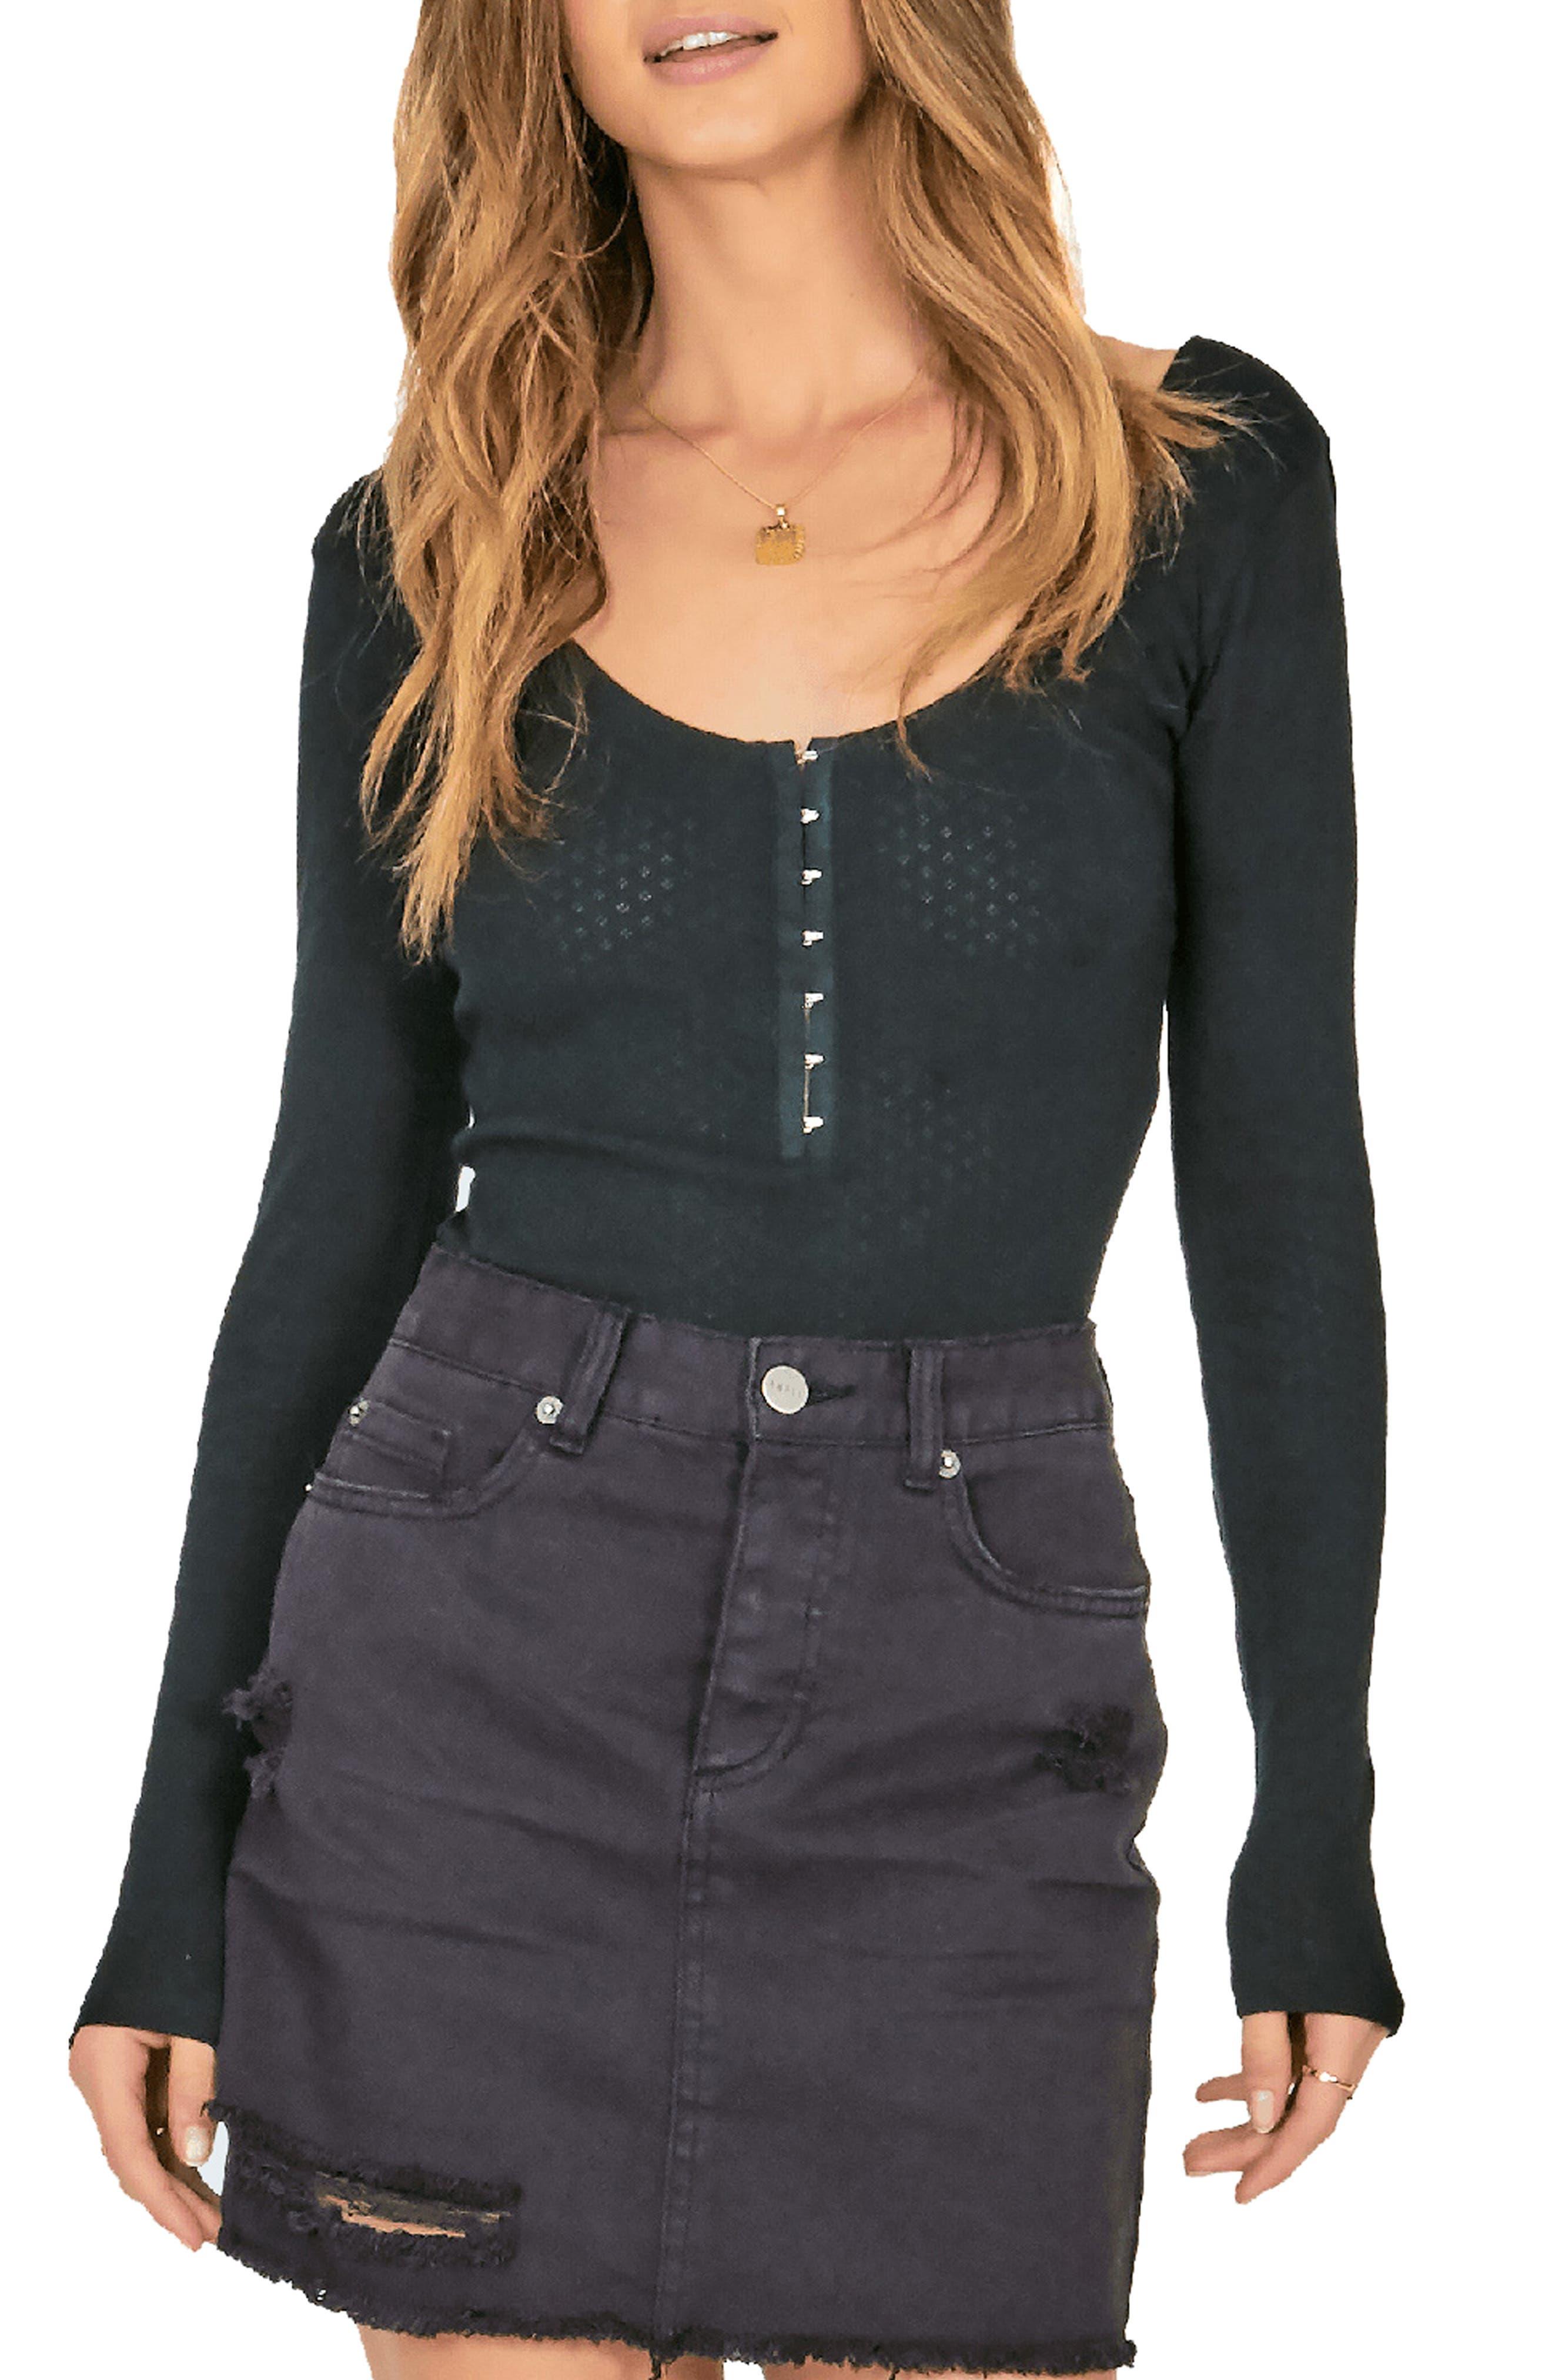 AMUSE SOCIETY Buena Suerte Bodysuit in Black